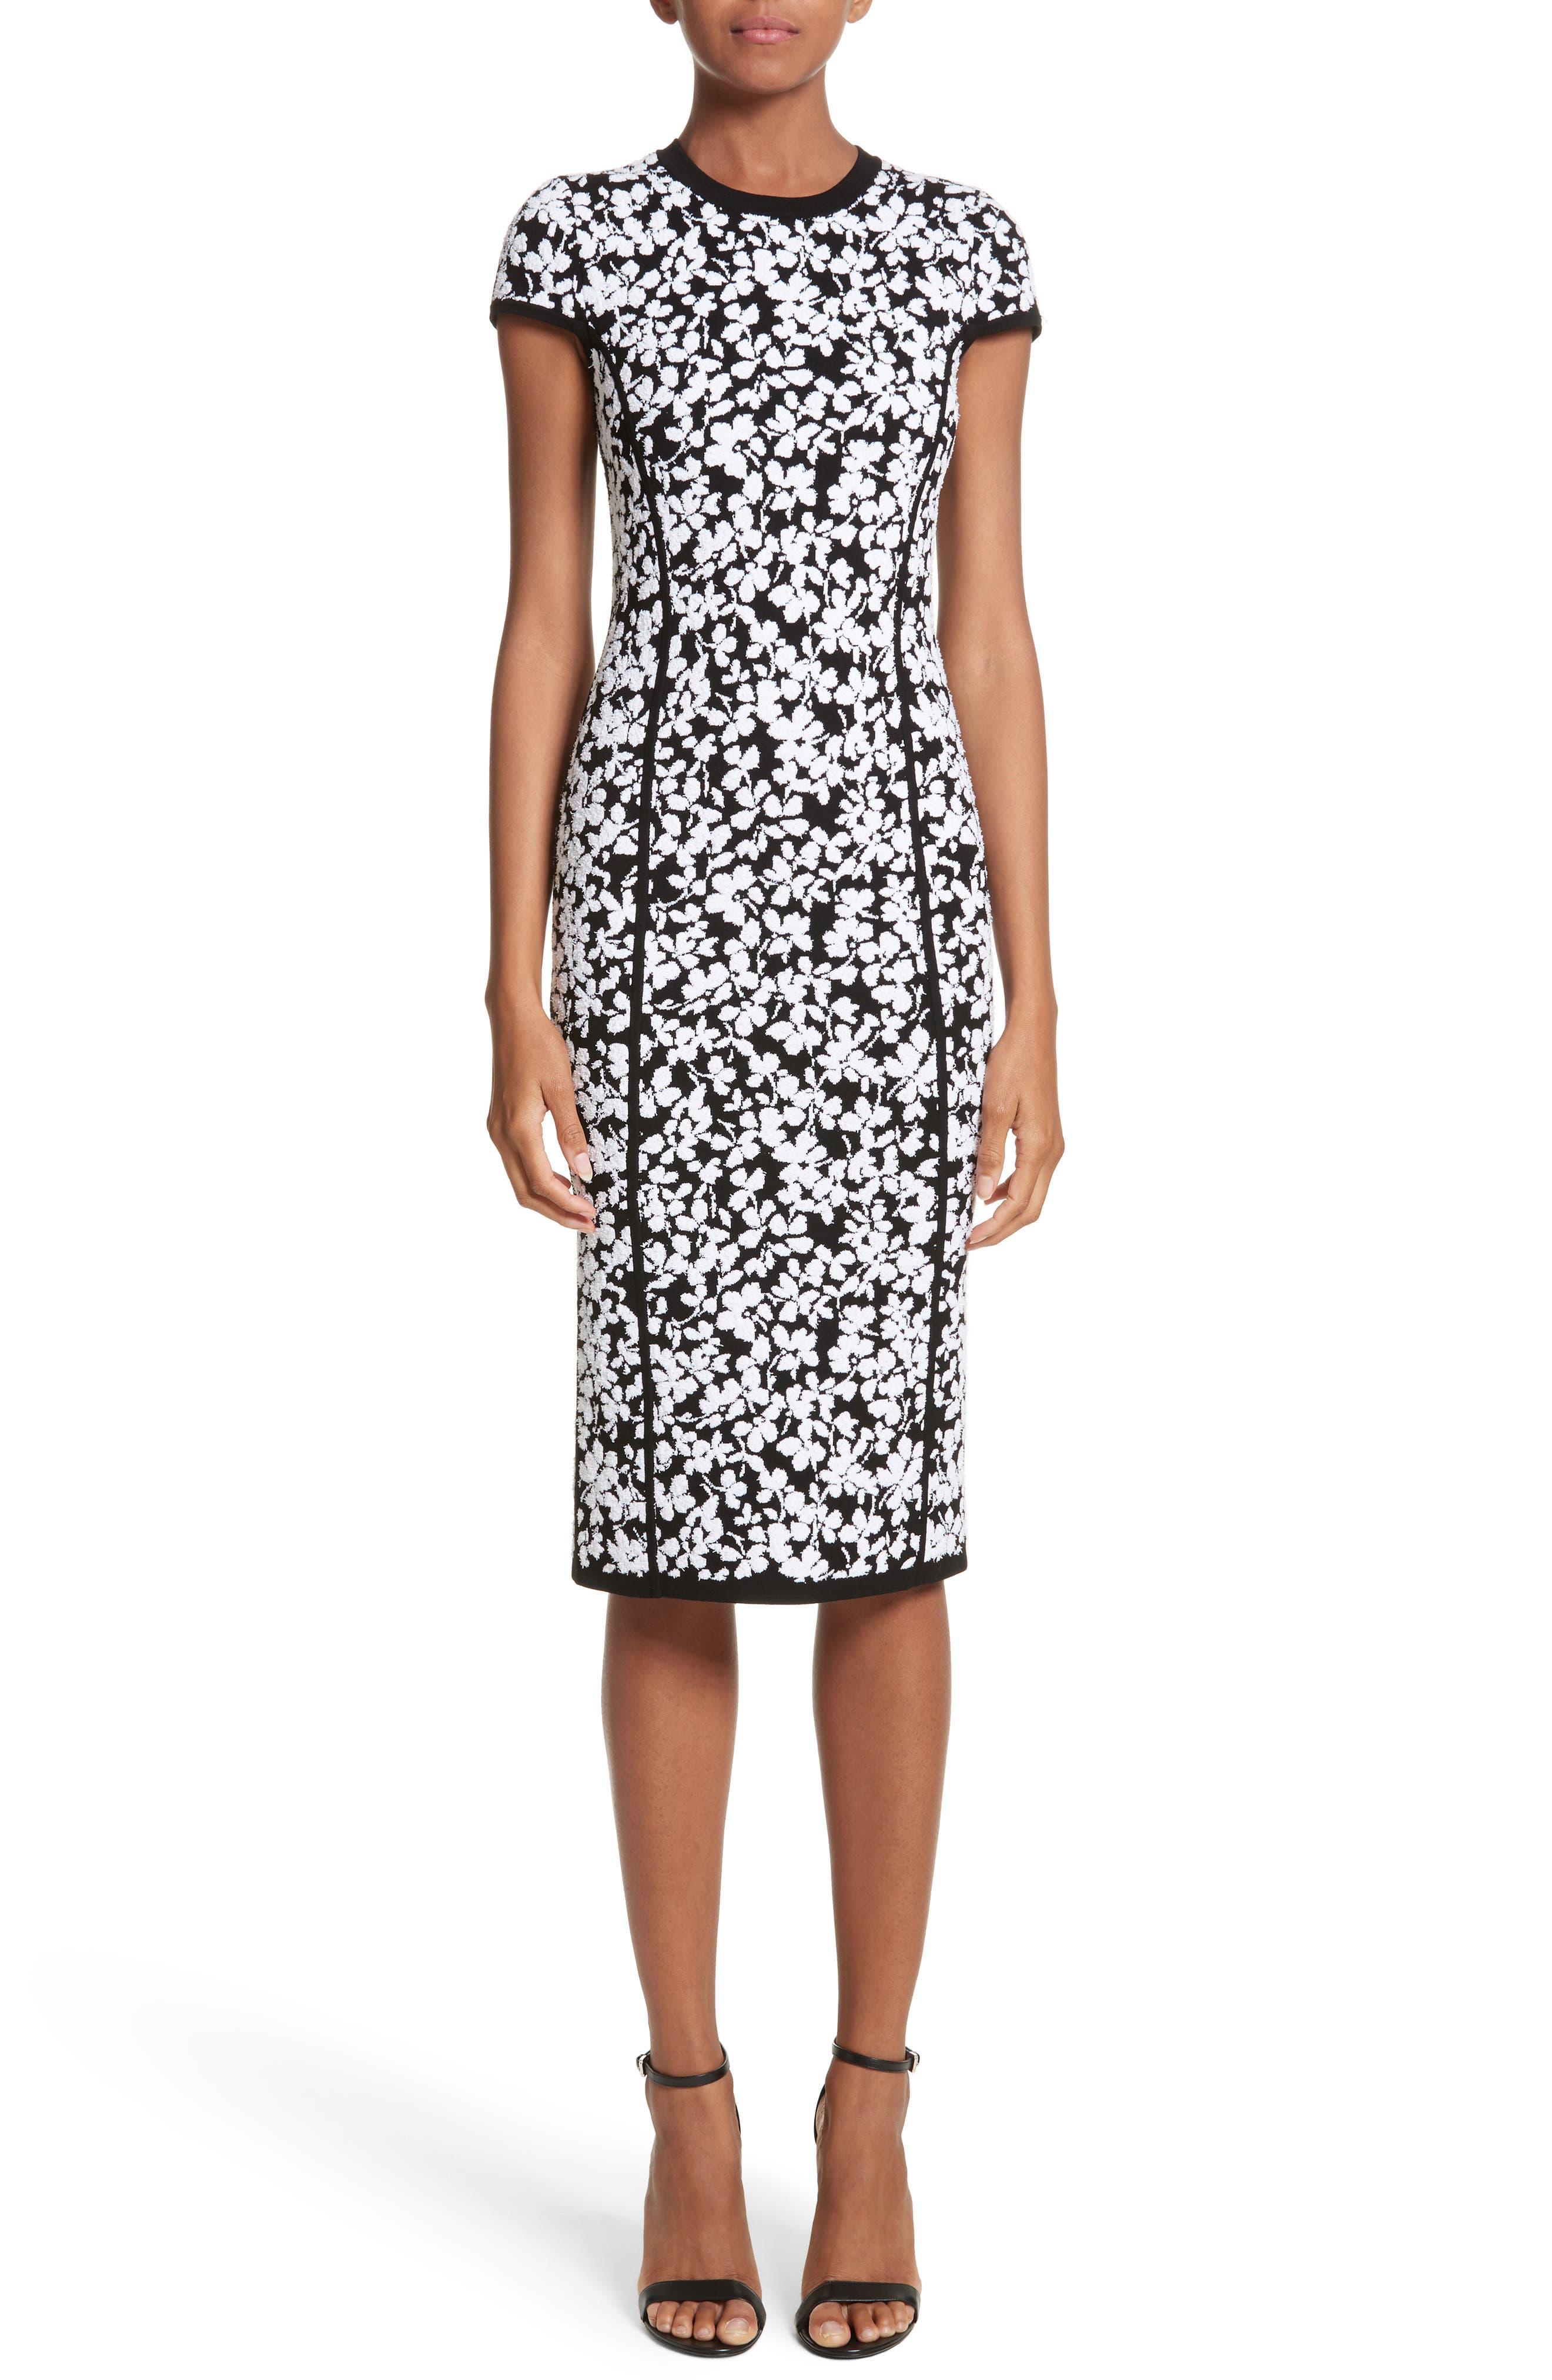 Main Image - Michael Kors Floral Jacquard Sheath Dress